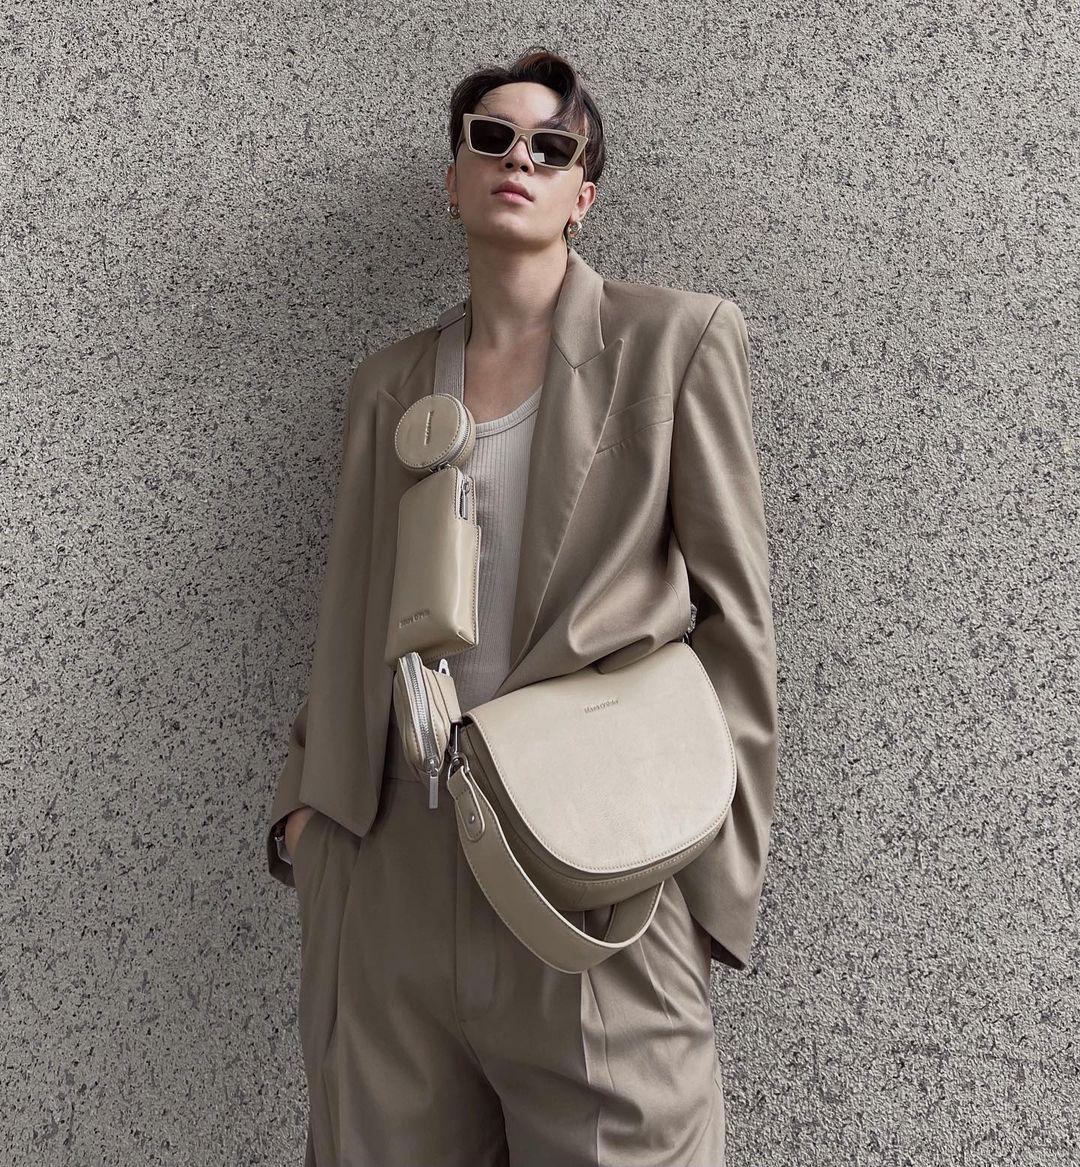 stylist kelbin lei phong cach minimalism - elle man (10)